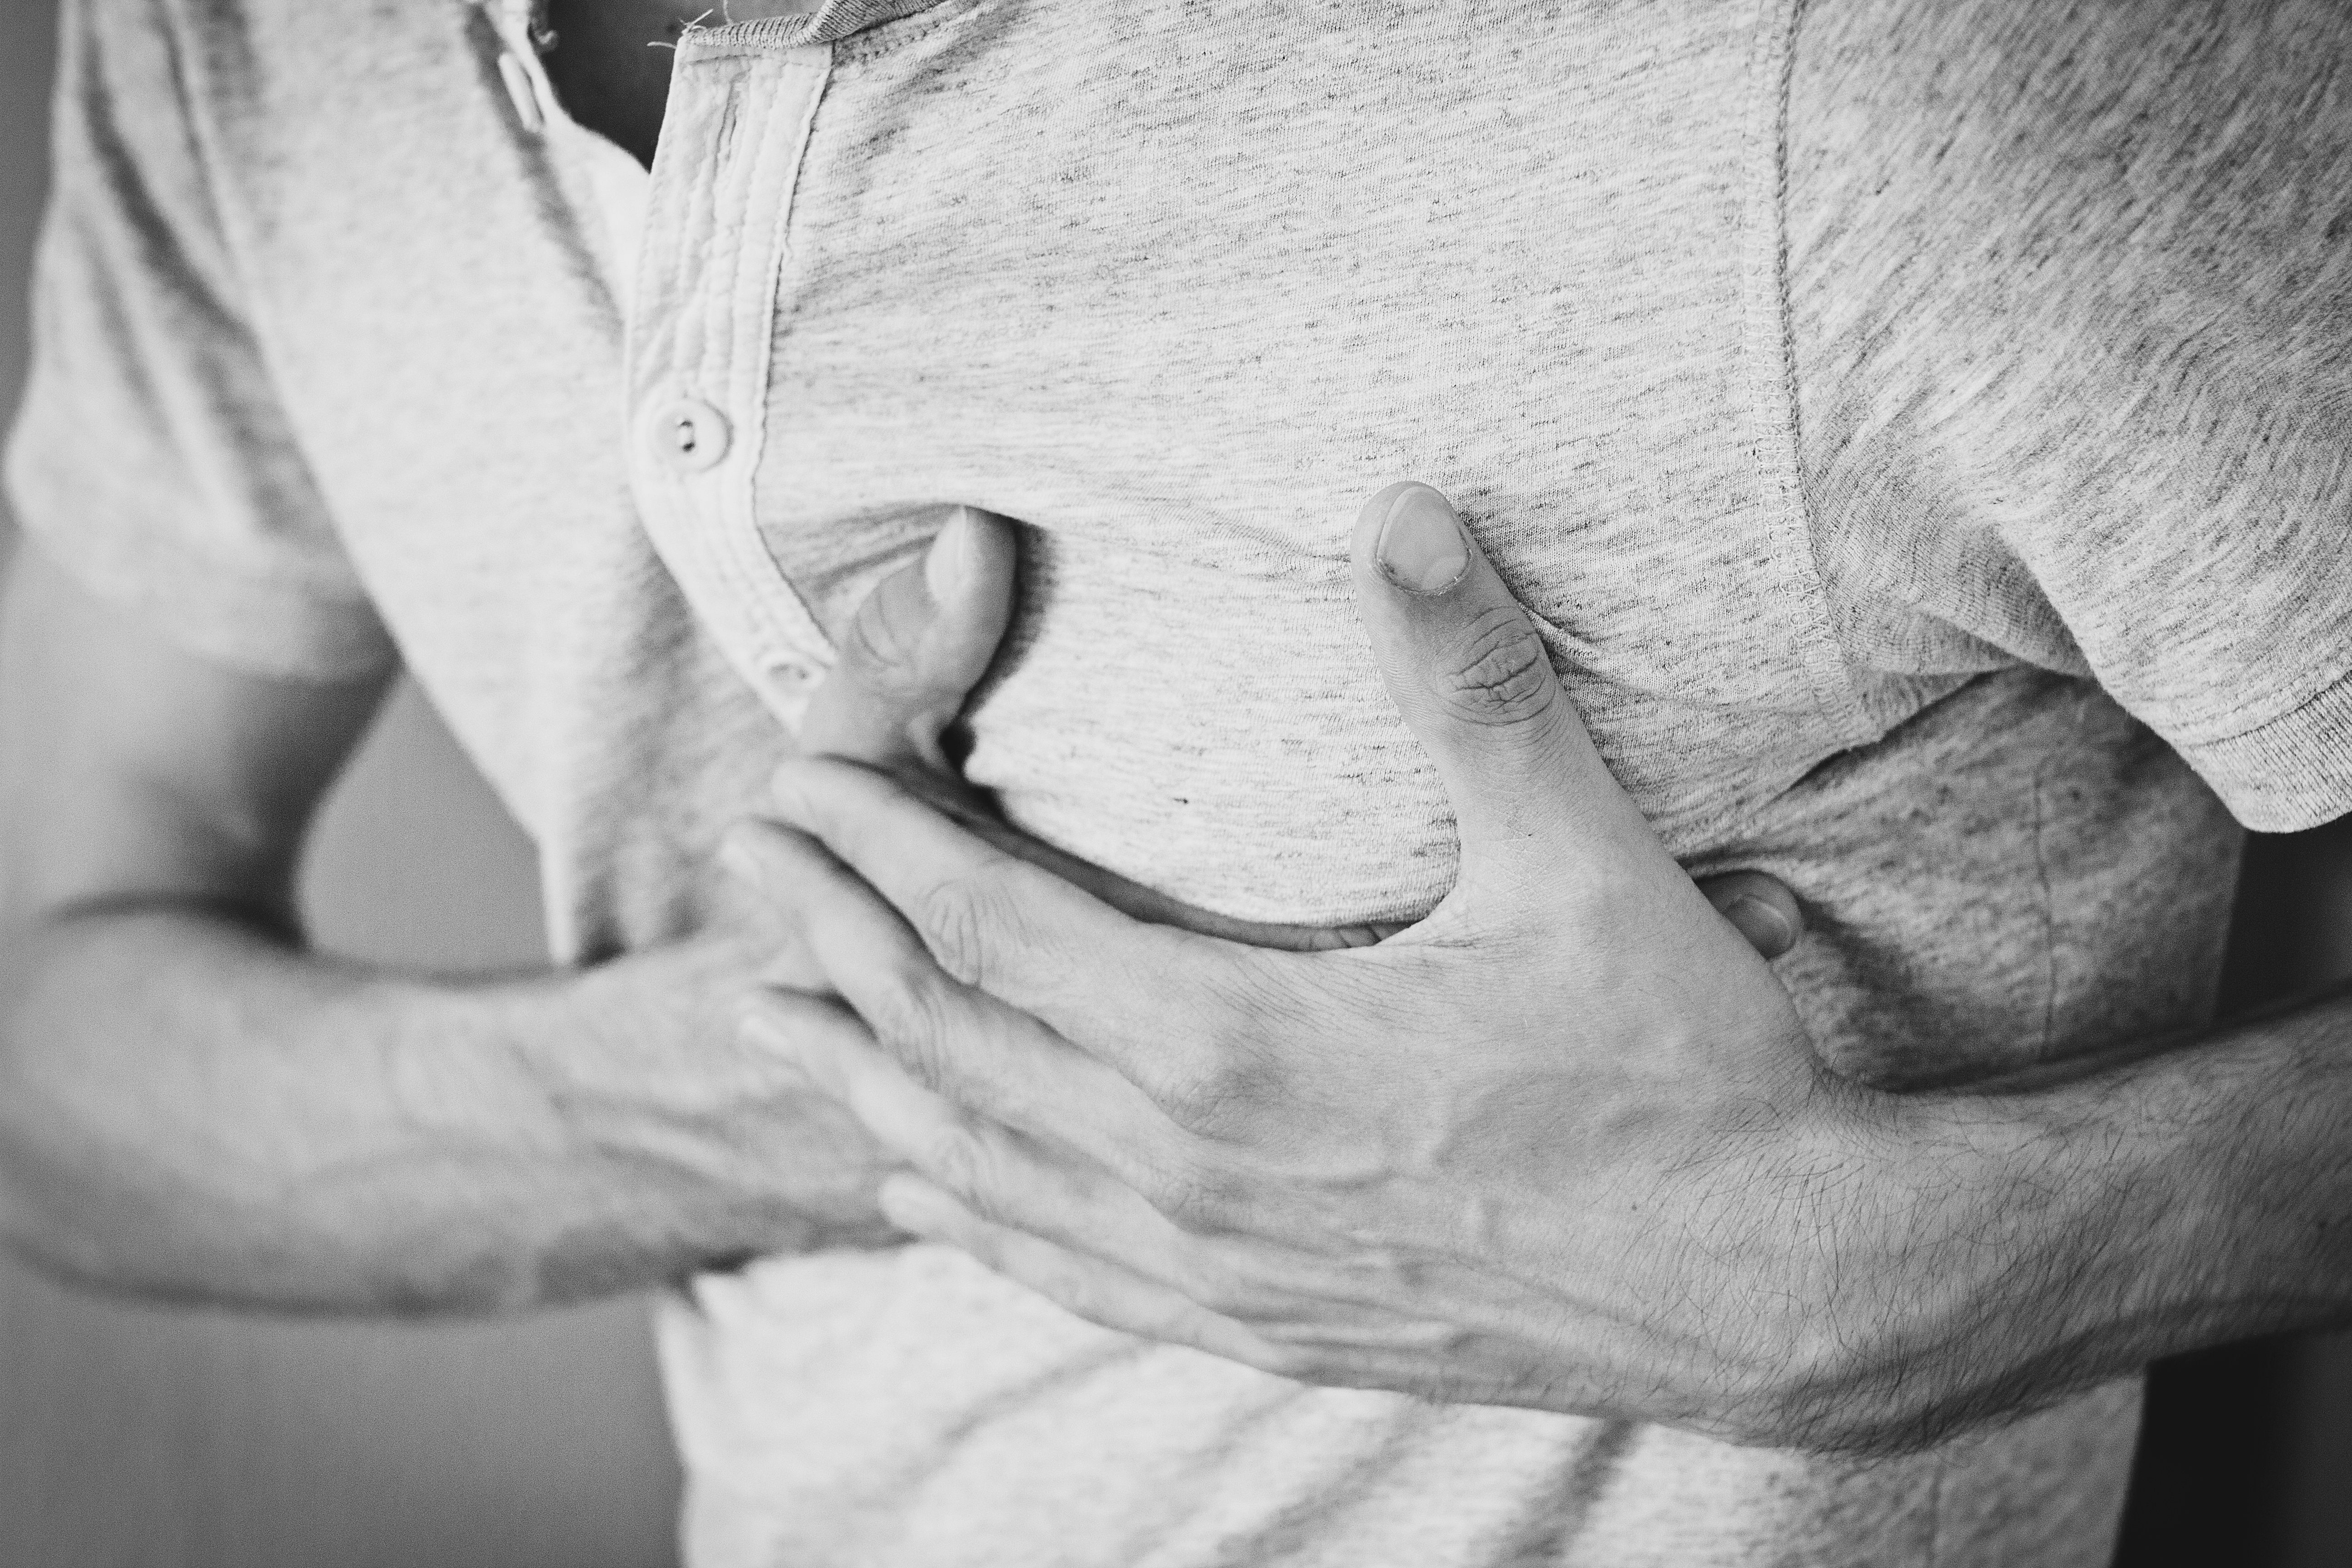 Risiko Penyakit Jantung dapat Dikurangi dengan Cara Sederhana Ini